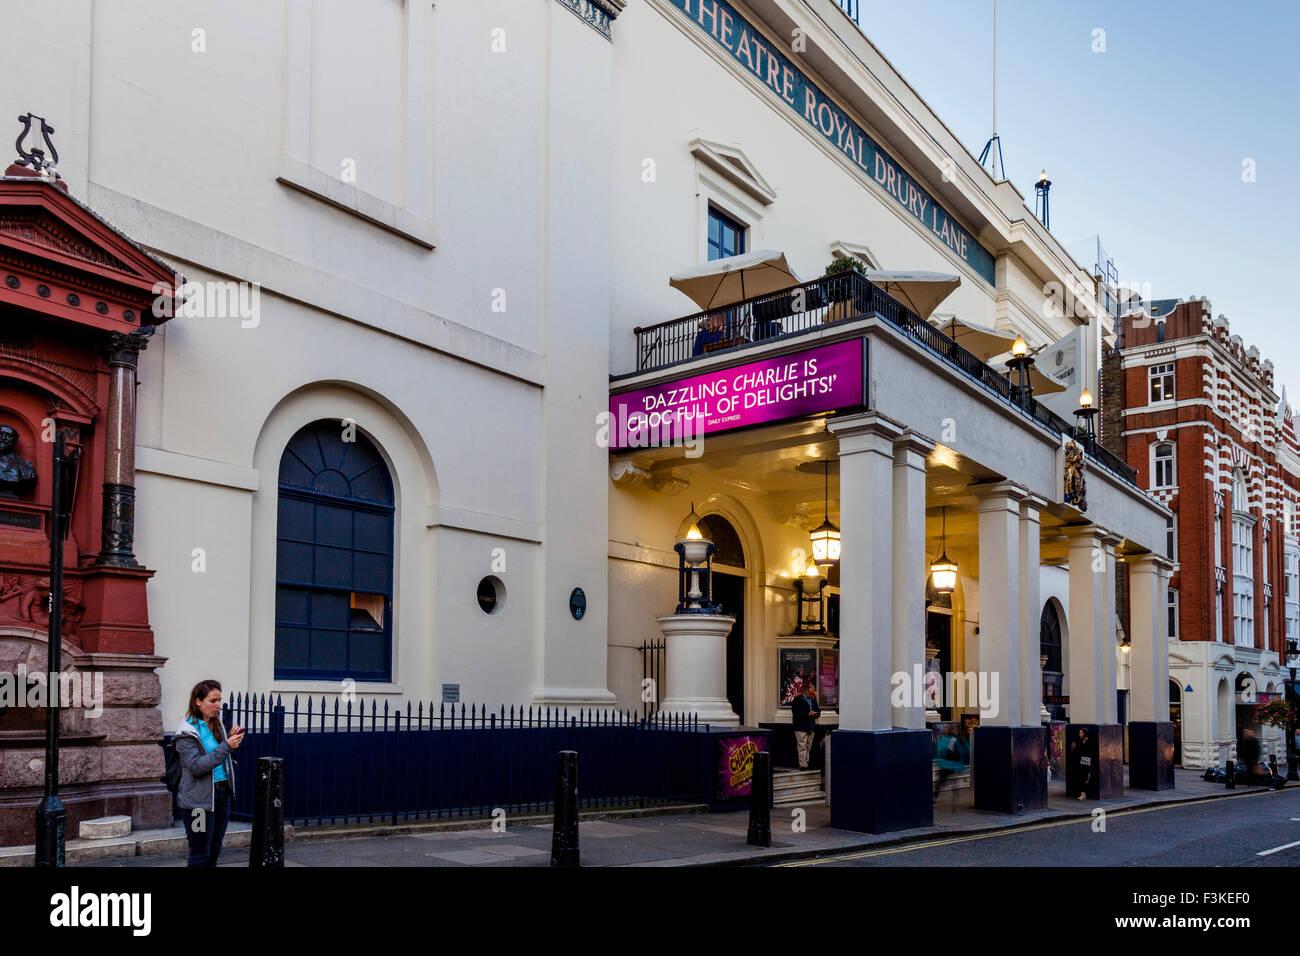 The Theatre Royal Drury Lane, Covent Garden, London, UK - Stock Image